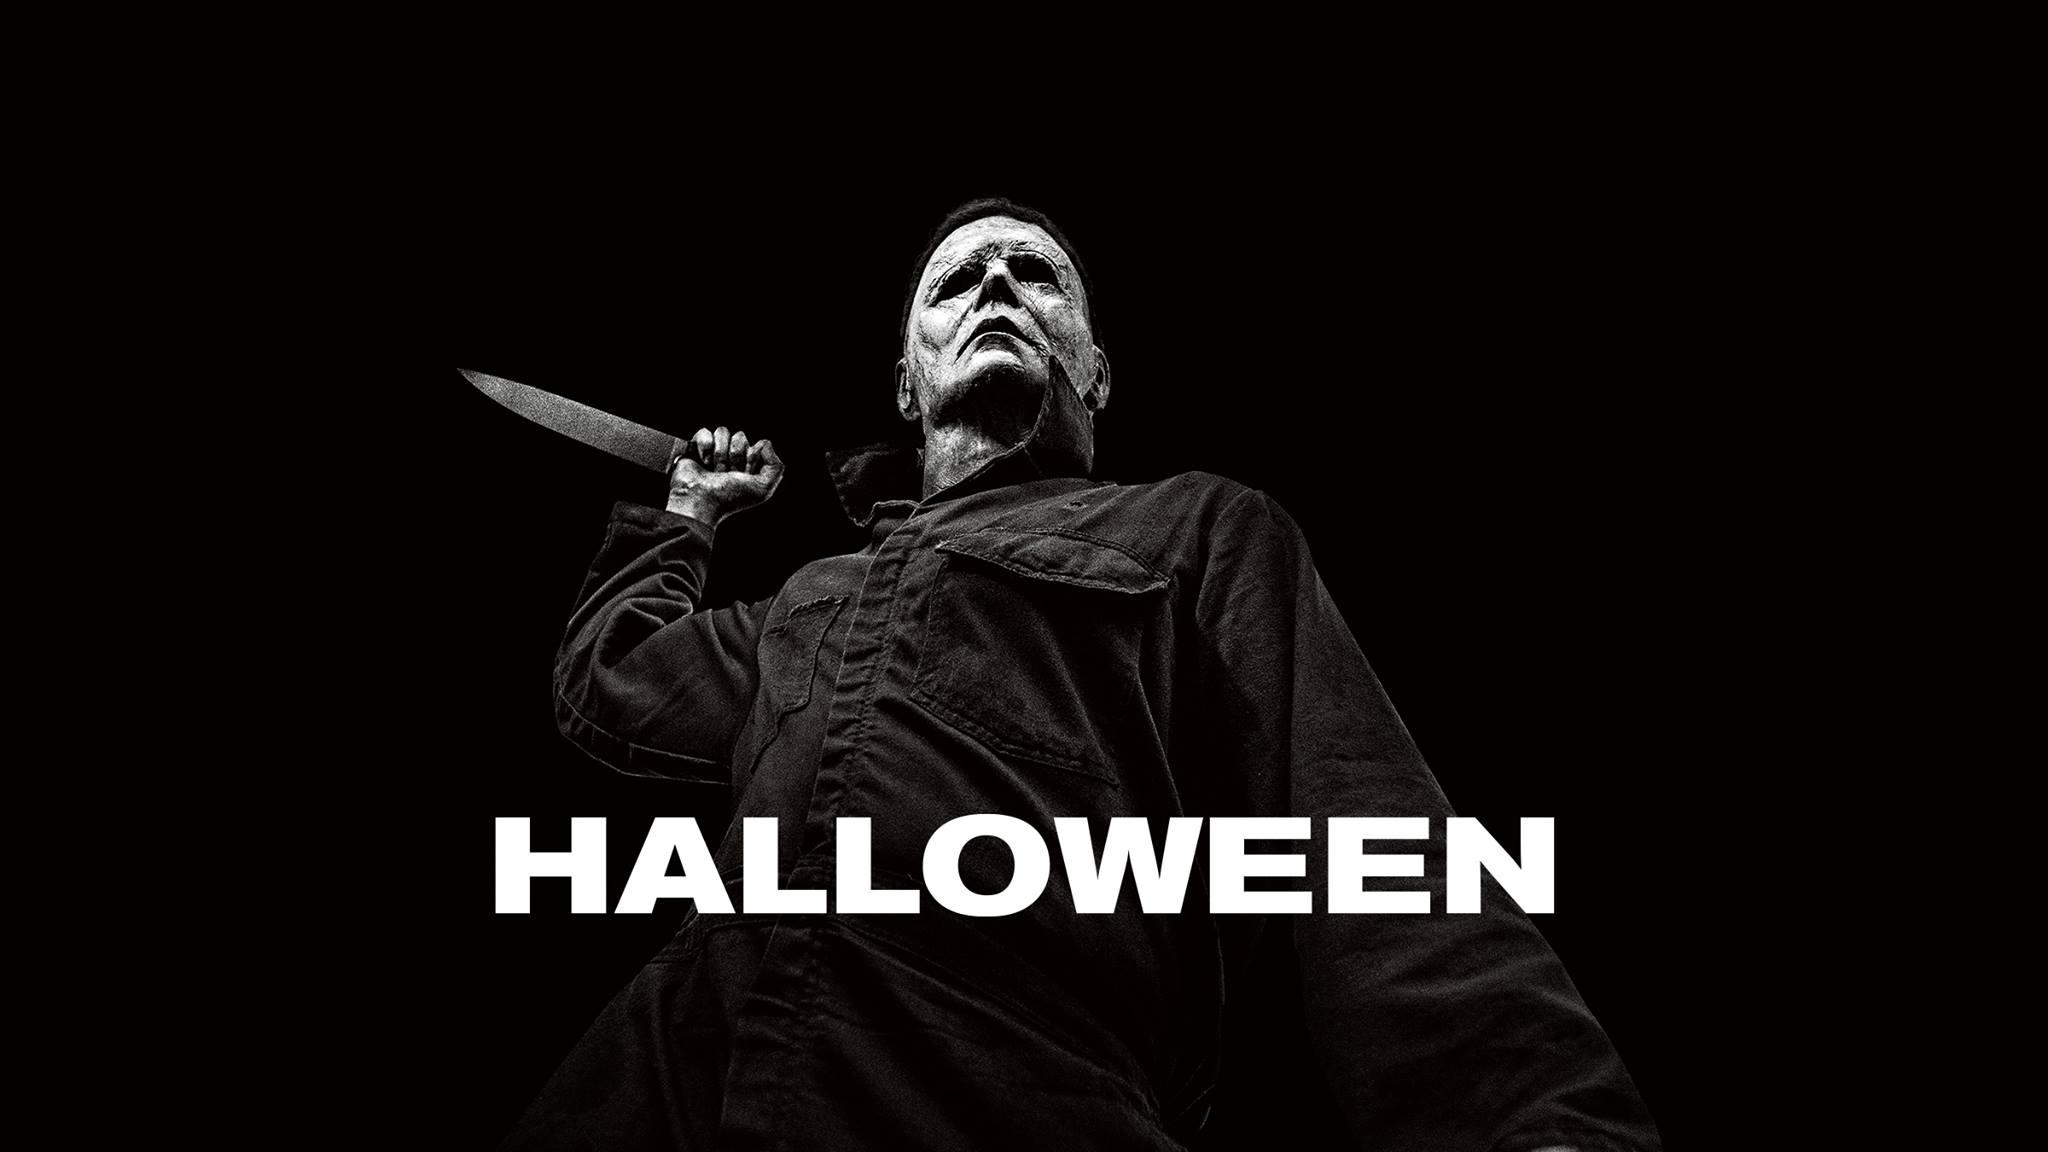 Halloween (Filme del 2018 al 2021) – Soundtrack, Tráiler